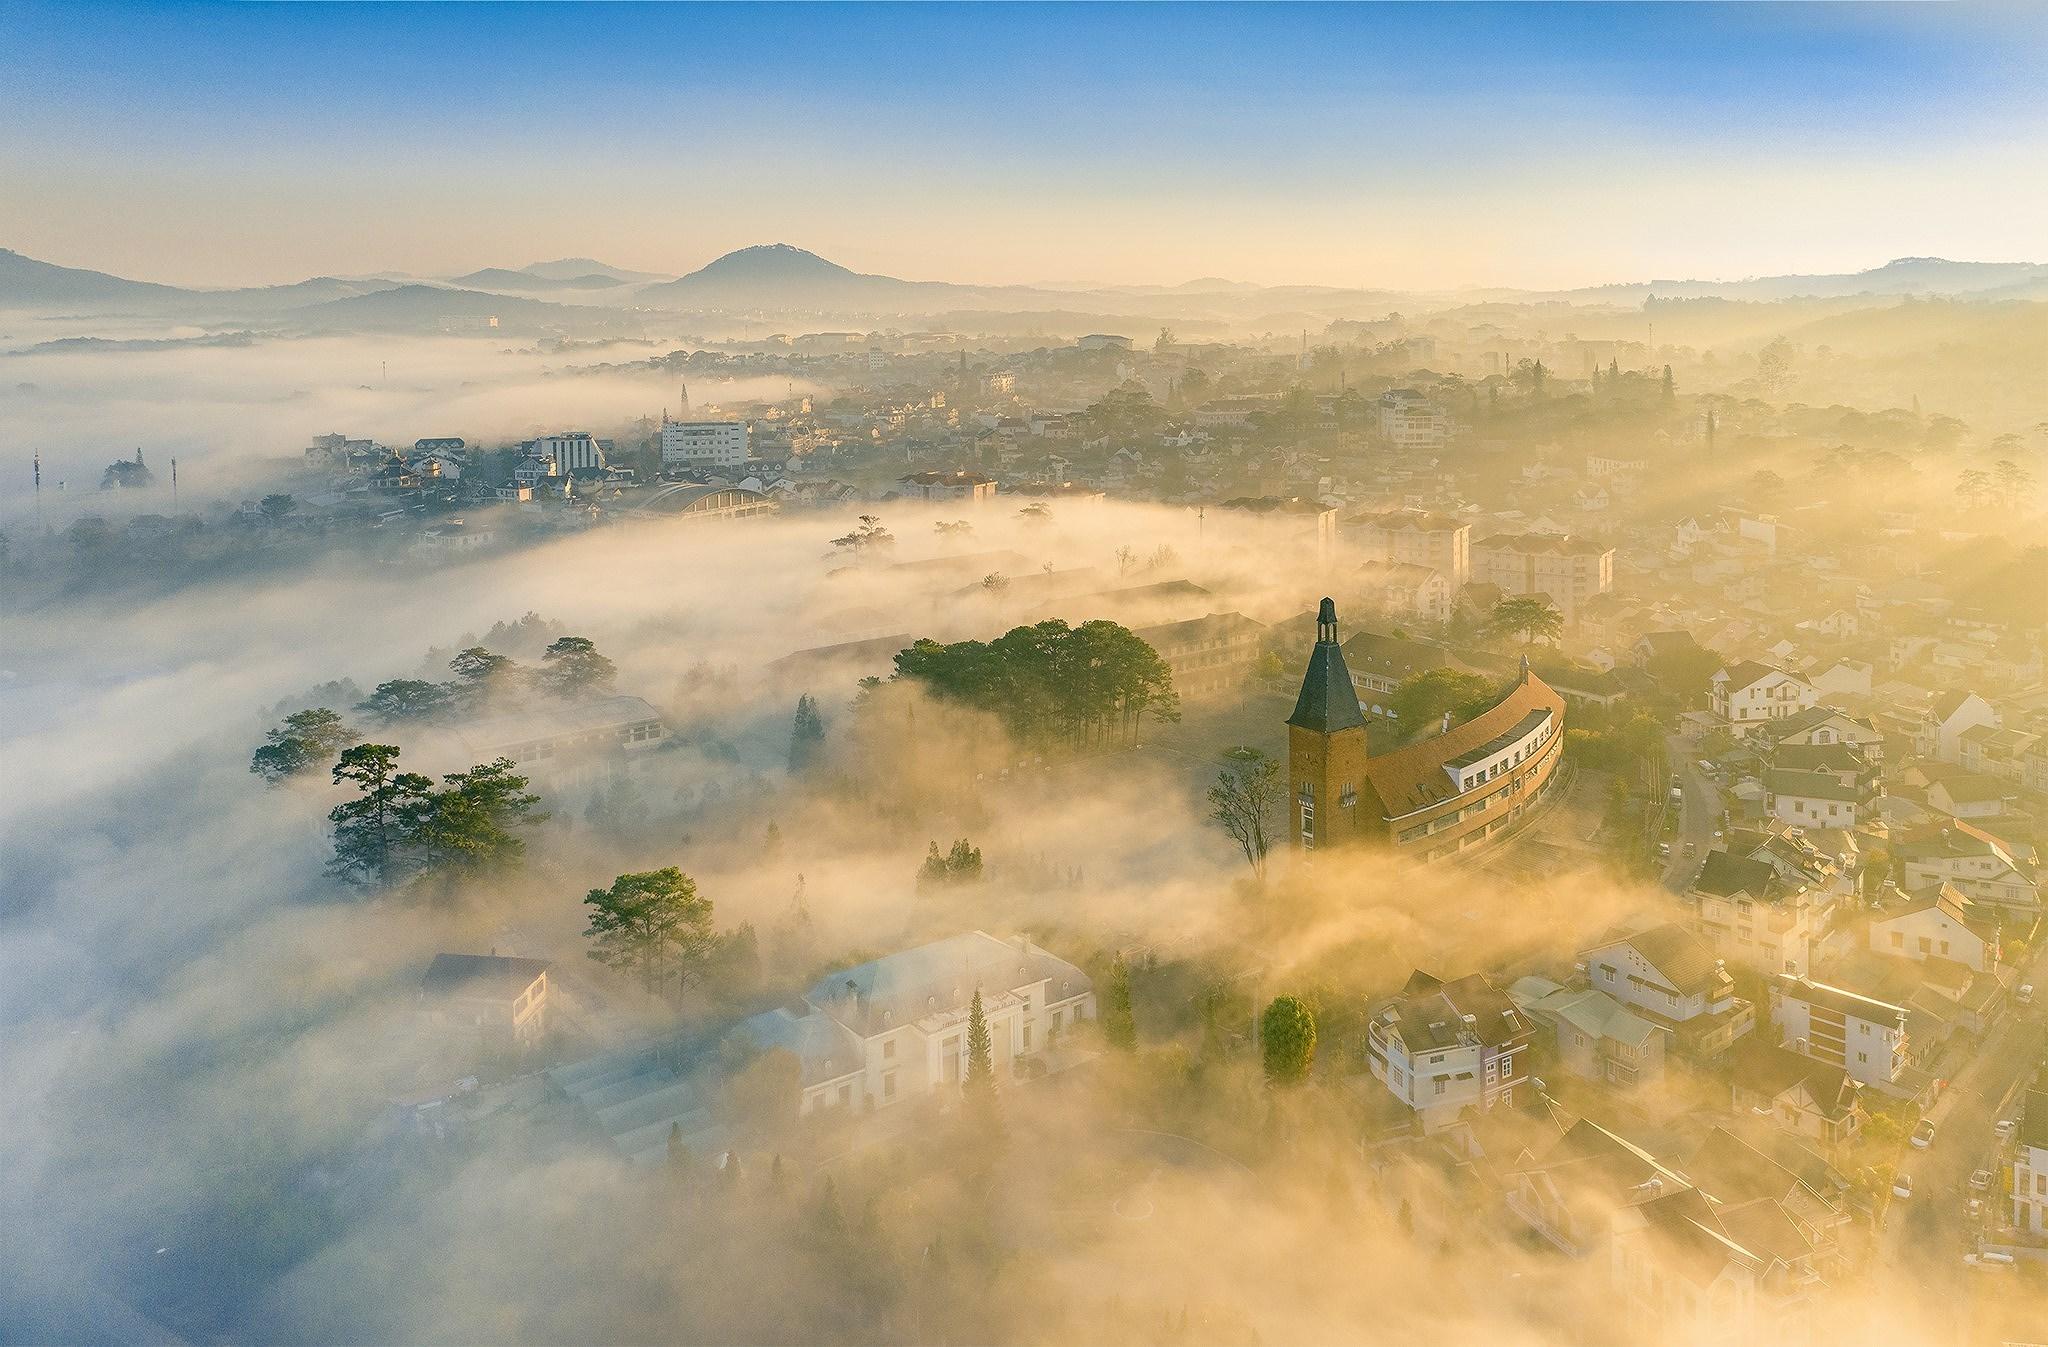 Photo exhibition showcasing Vietnam's beauty hinh anh 2